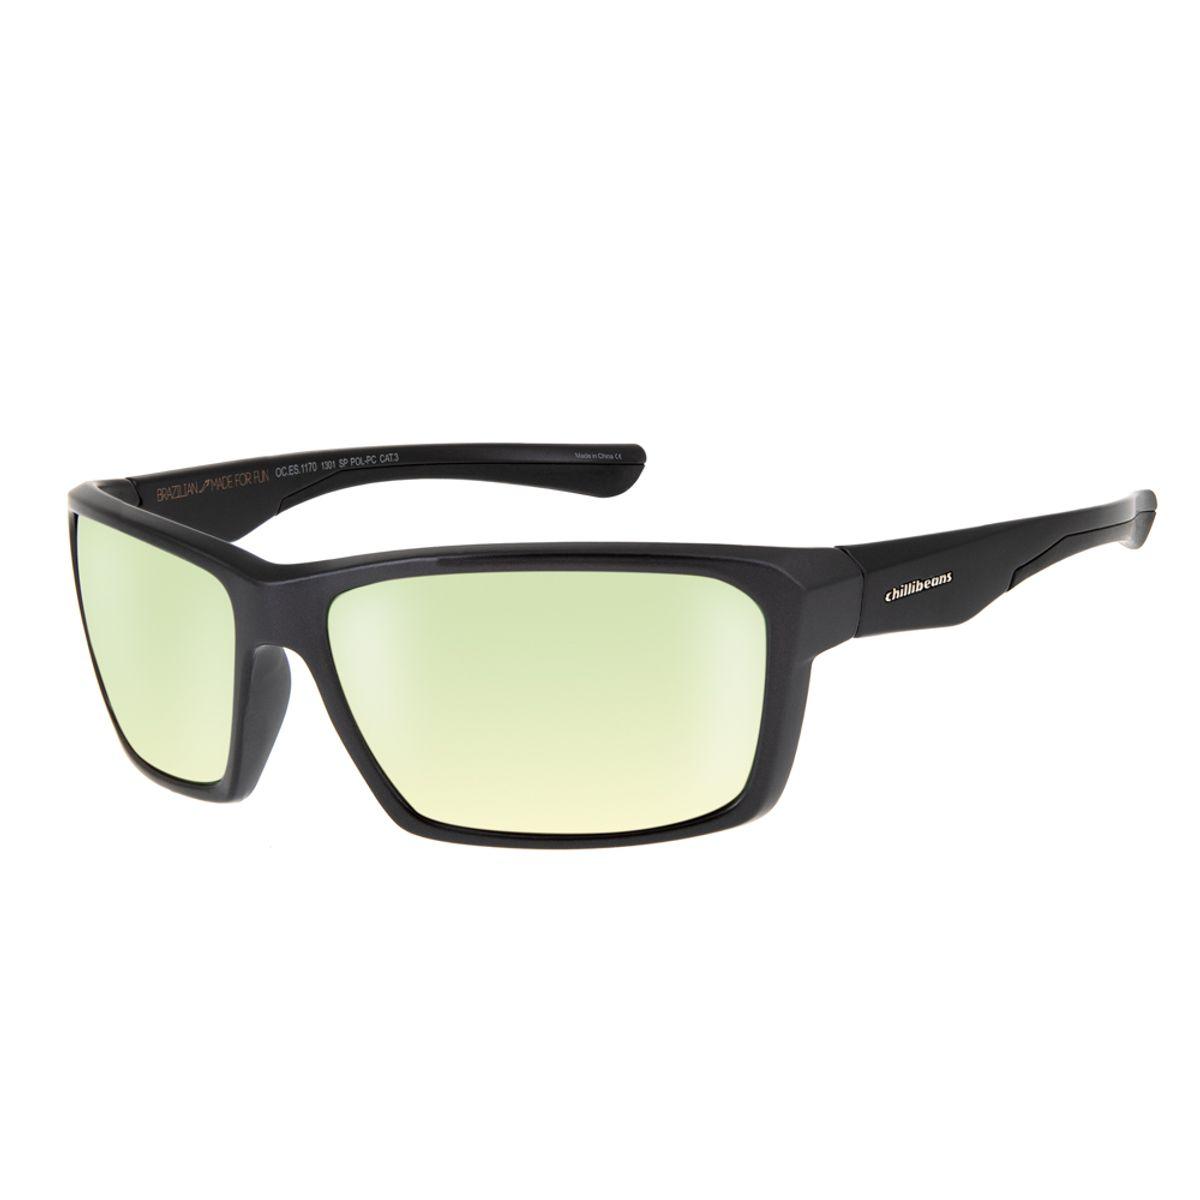 43a4034aa oculos de sol chilli beans esportivo unissex preto espelhado polarizado  1170 1301 ...